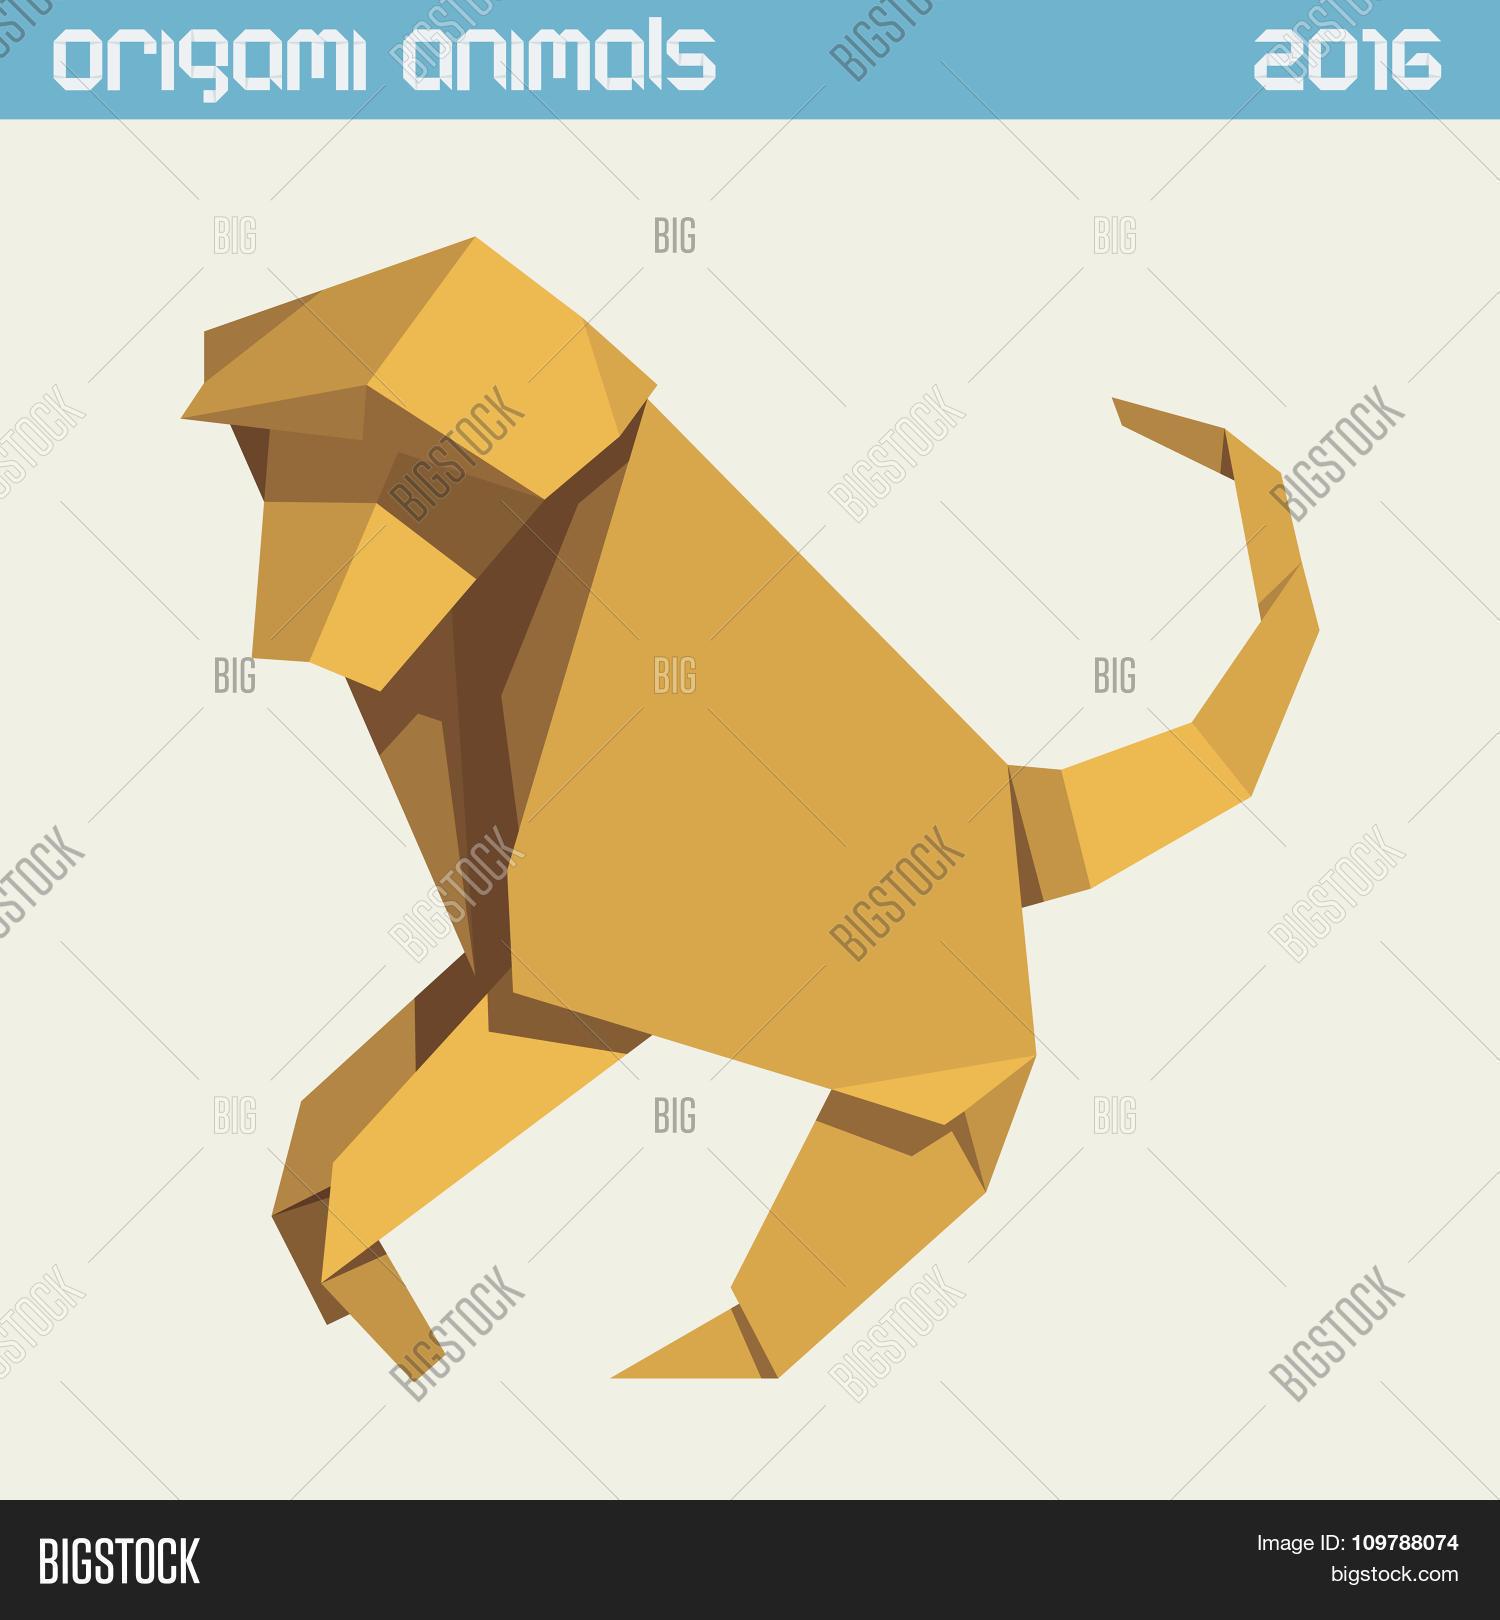 Origami monkey Royalty Free Vector Image - VectorStock | 1620x1500